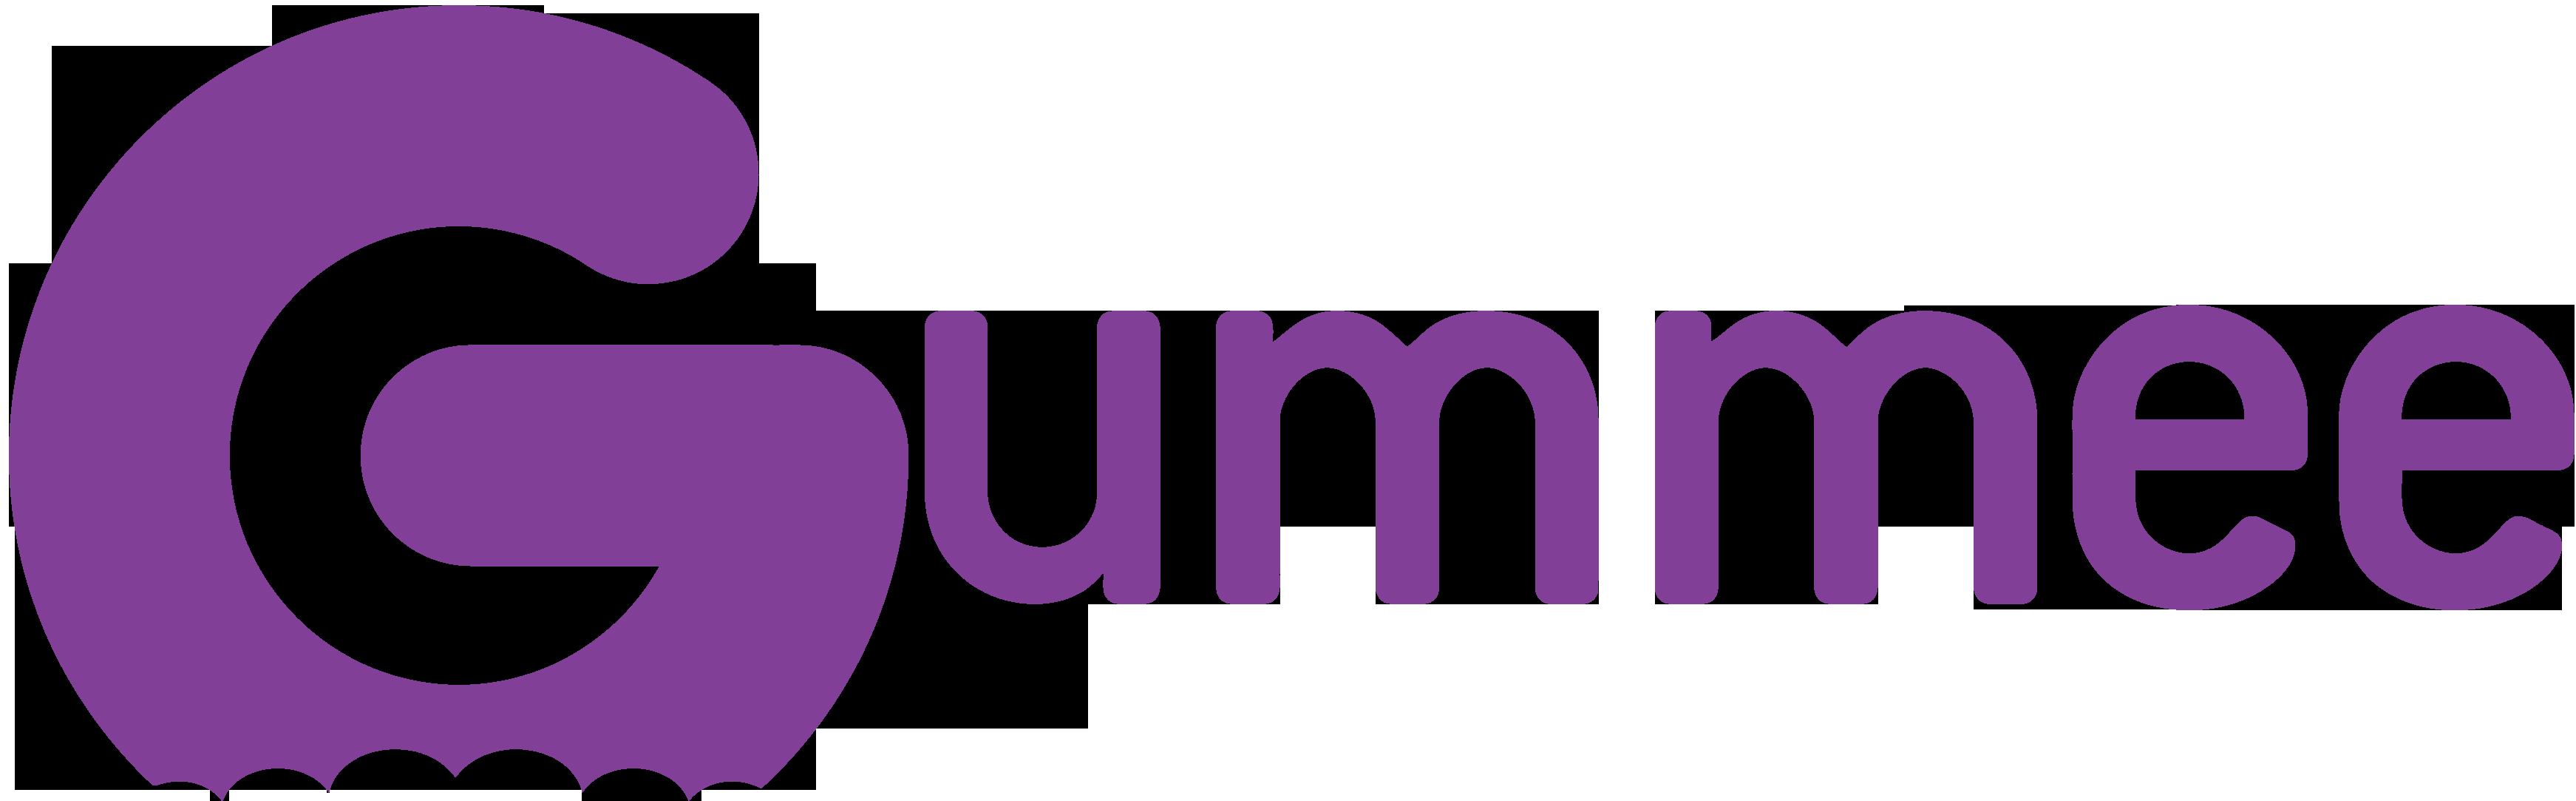 Gummee Glove logo